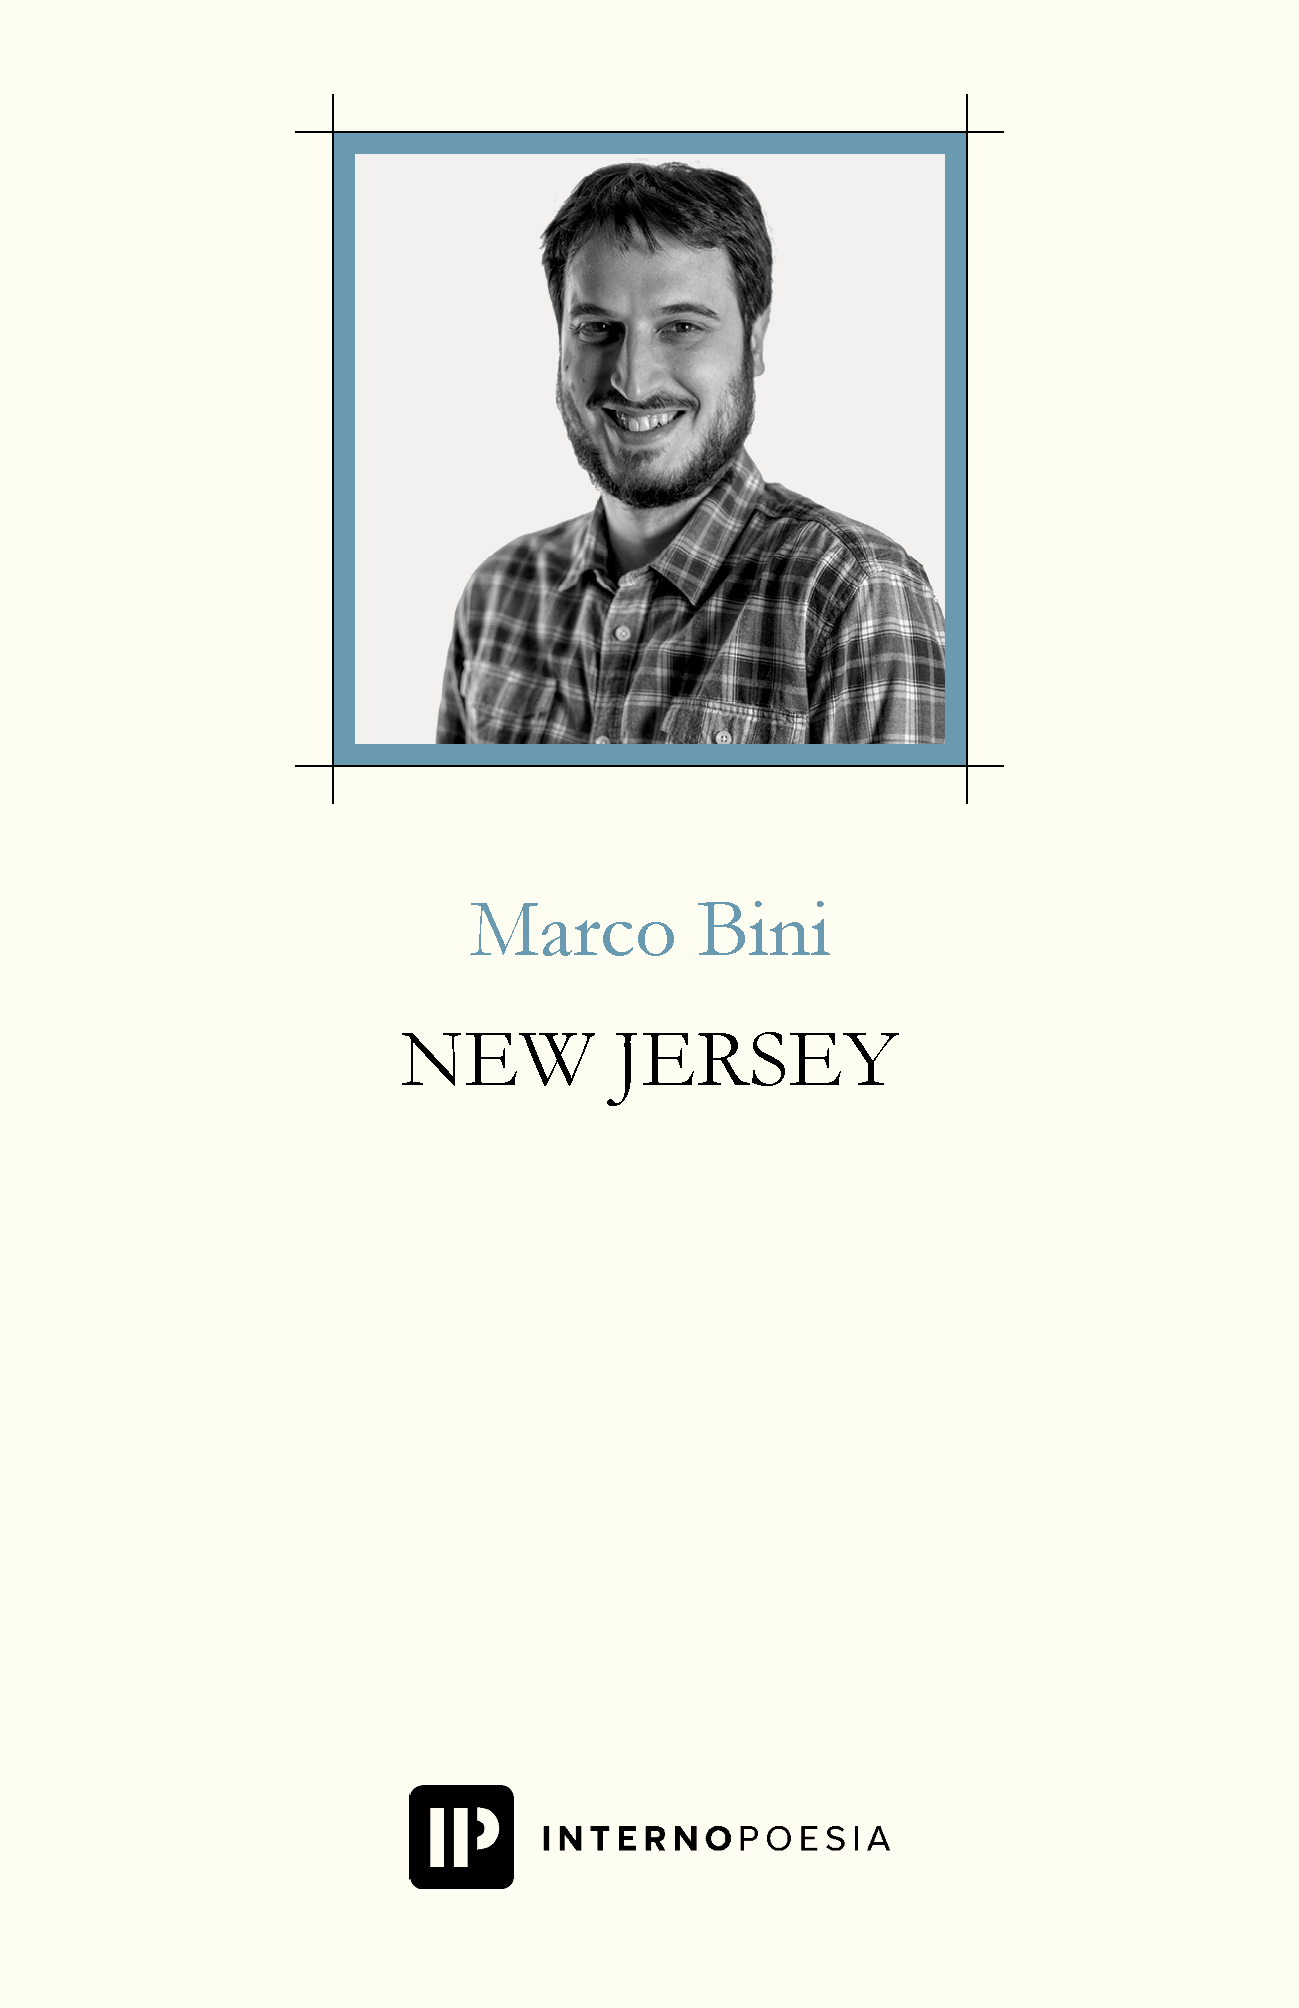 Marco Bini New Jersey Libro Poesia Modena